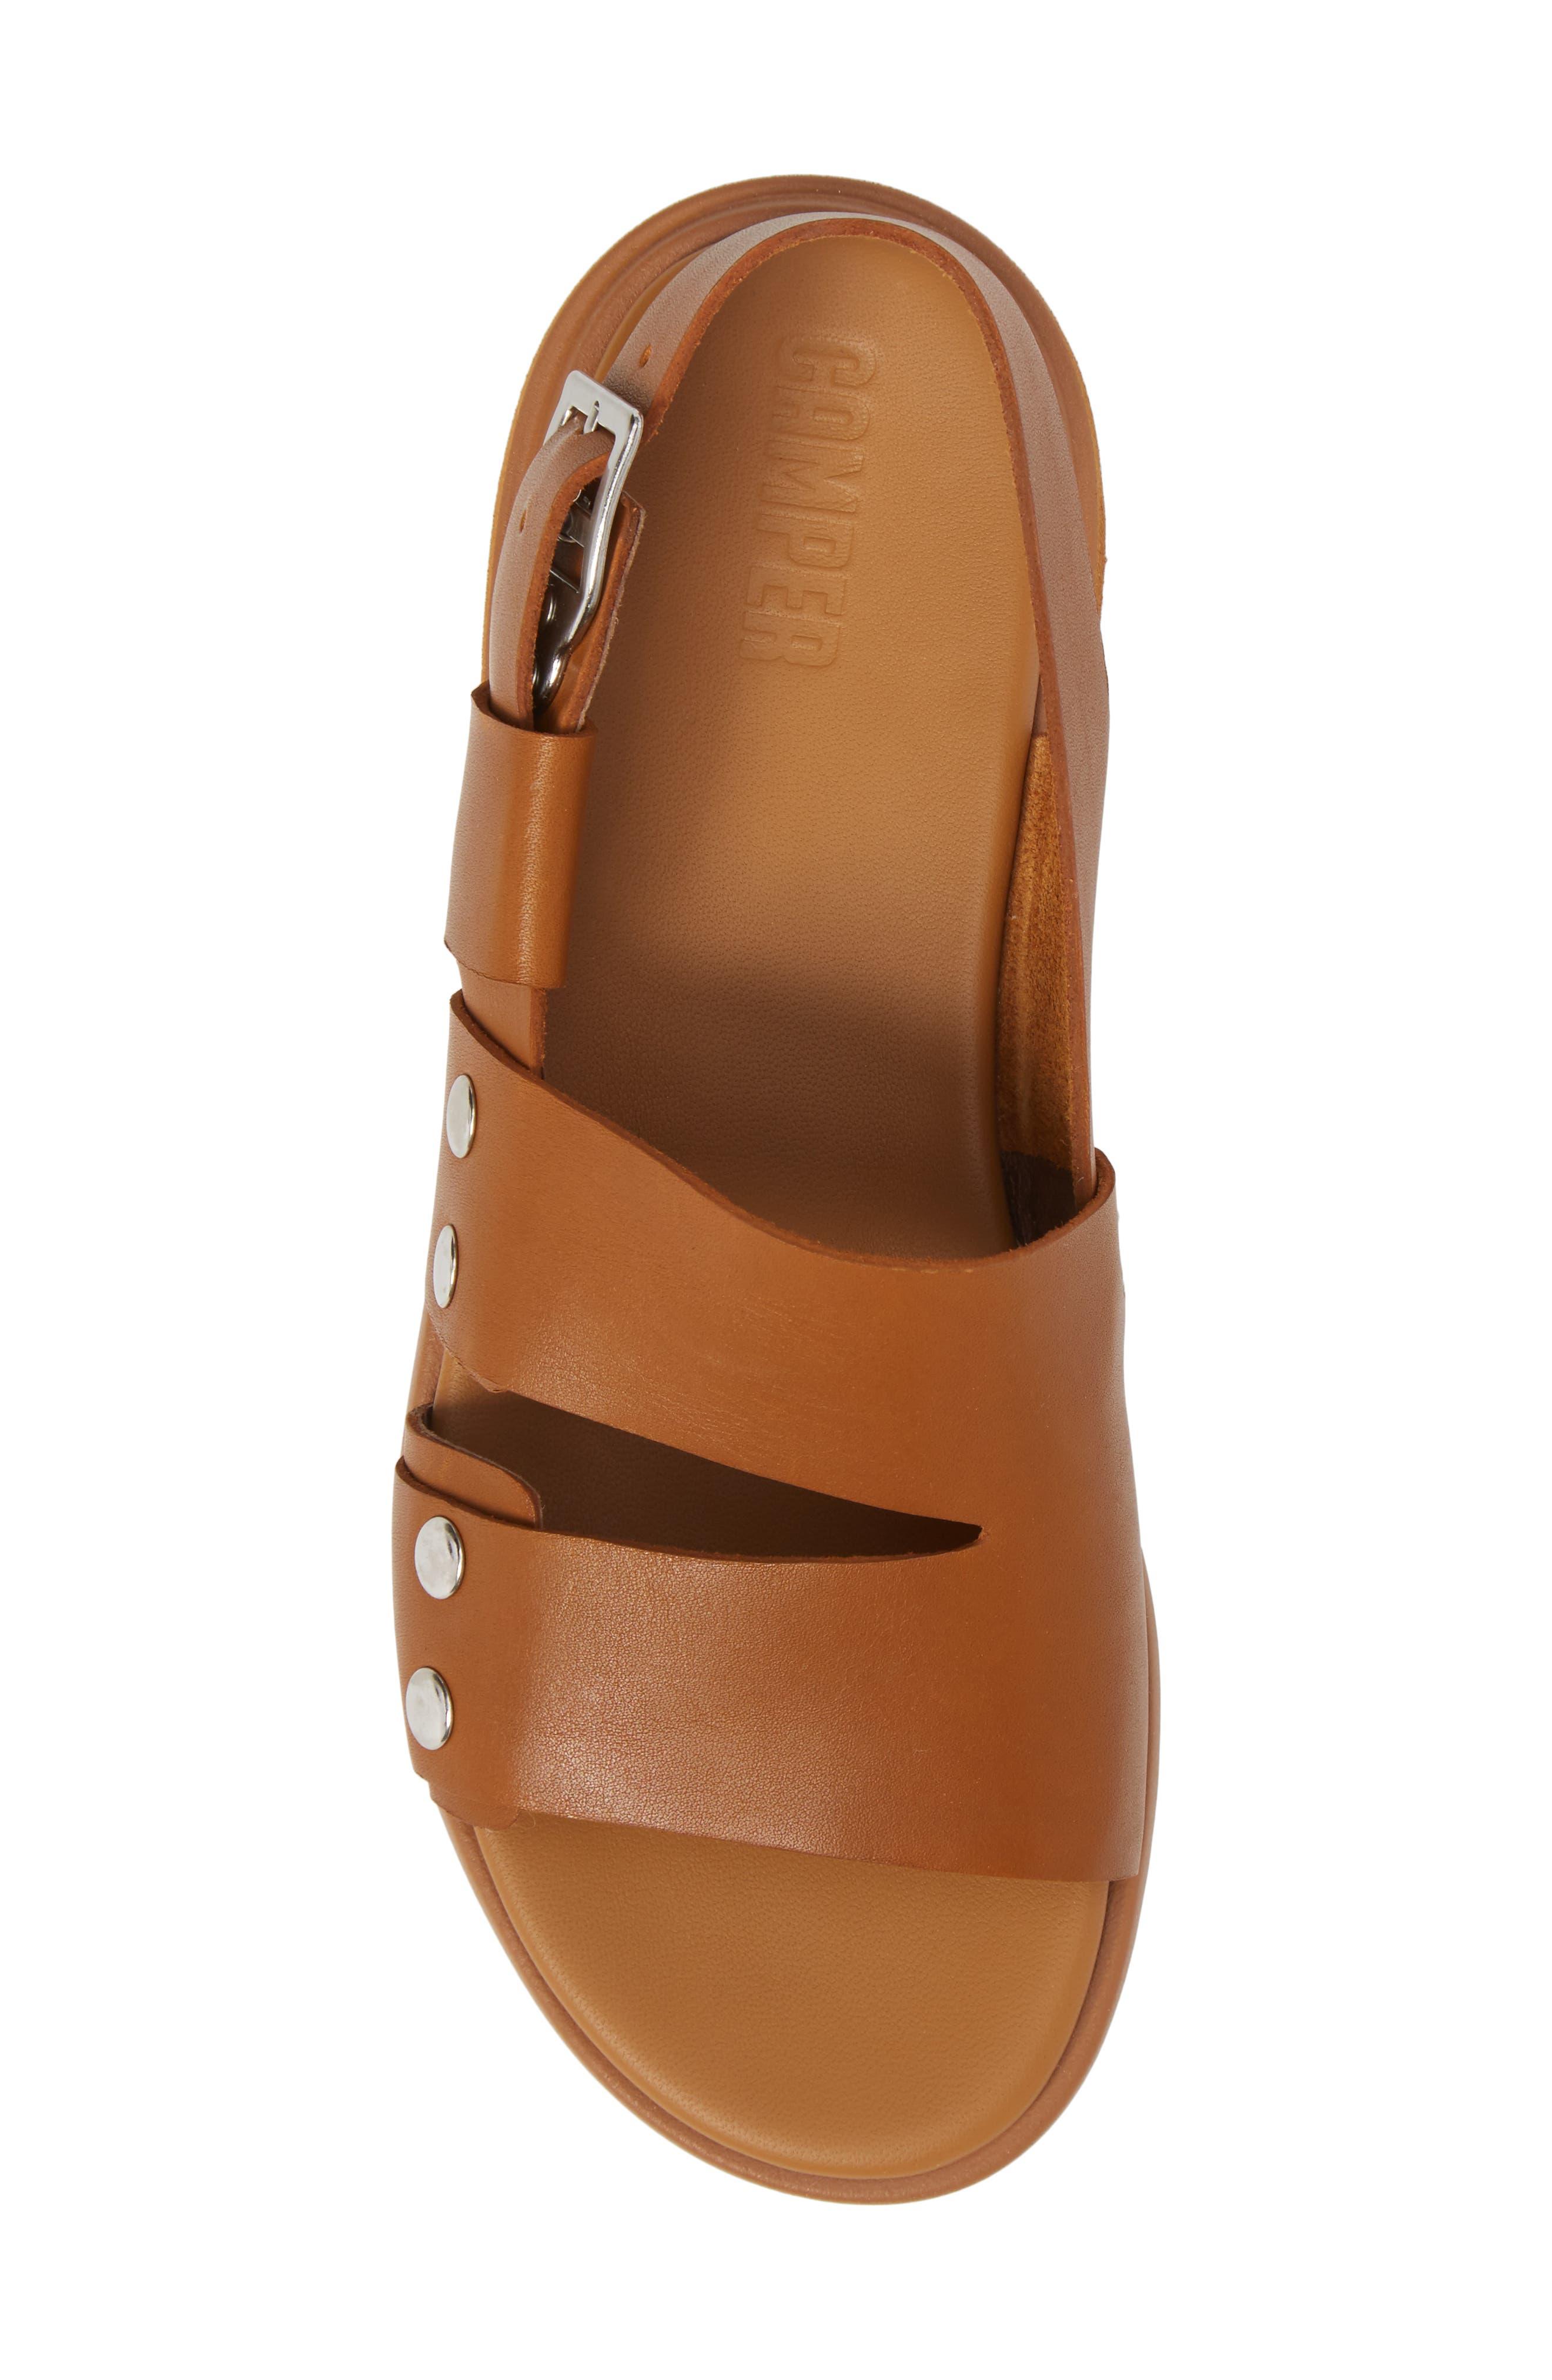 Edy Slingback Sandal,                             Alternate thumbnail 5, color,                             Rust/ Copper Leather